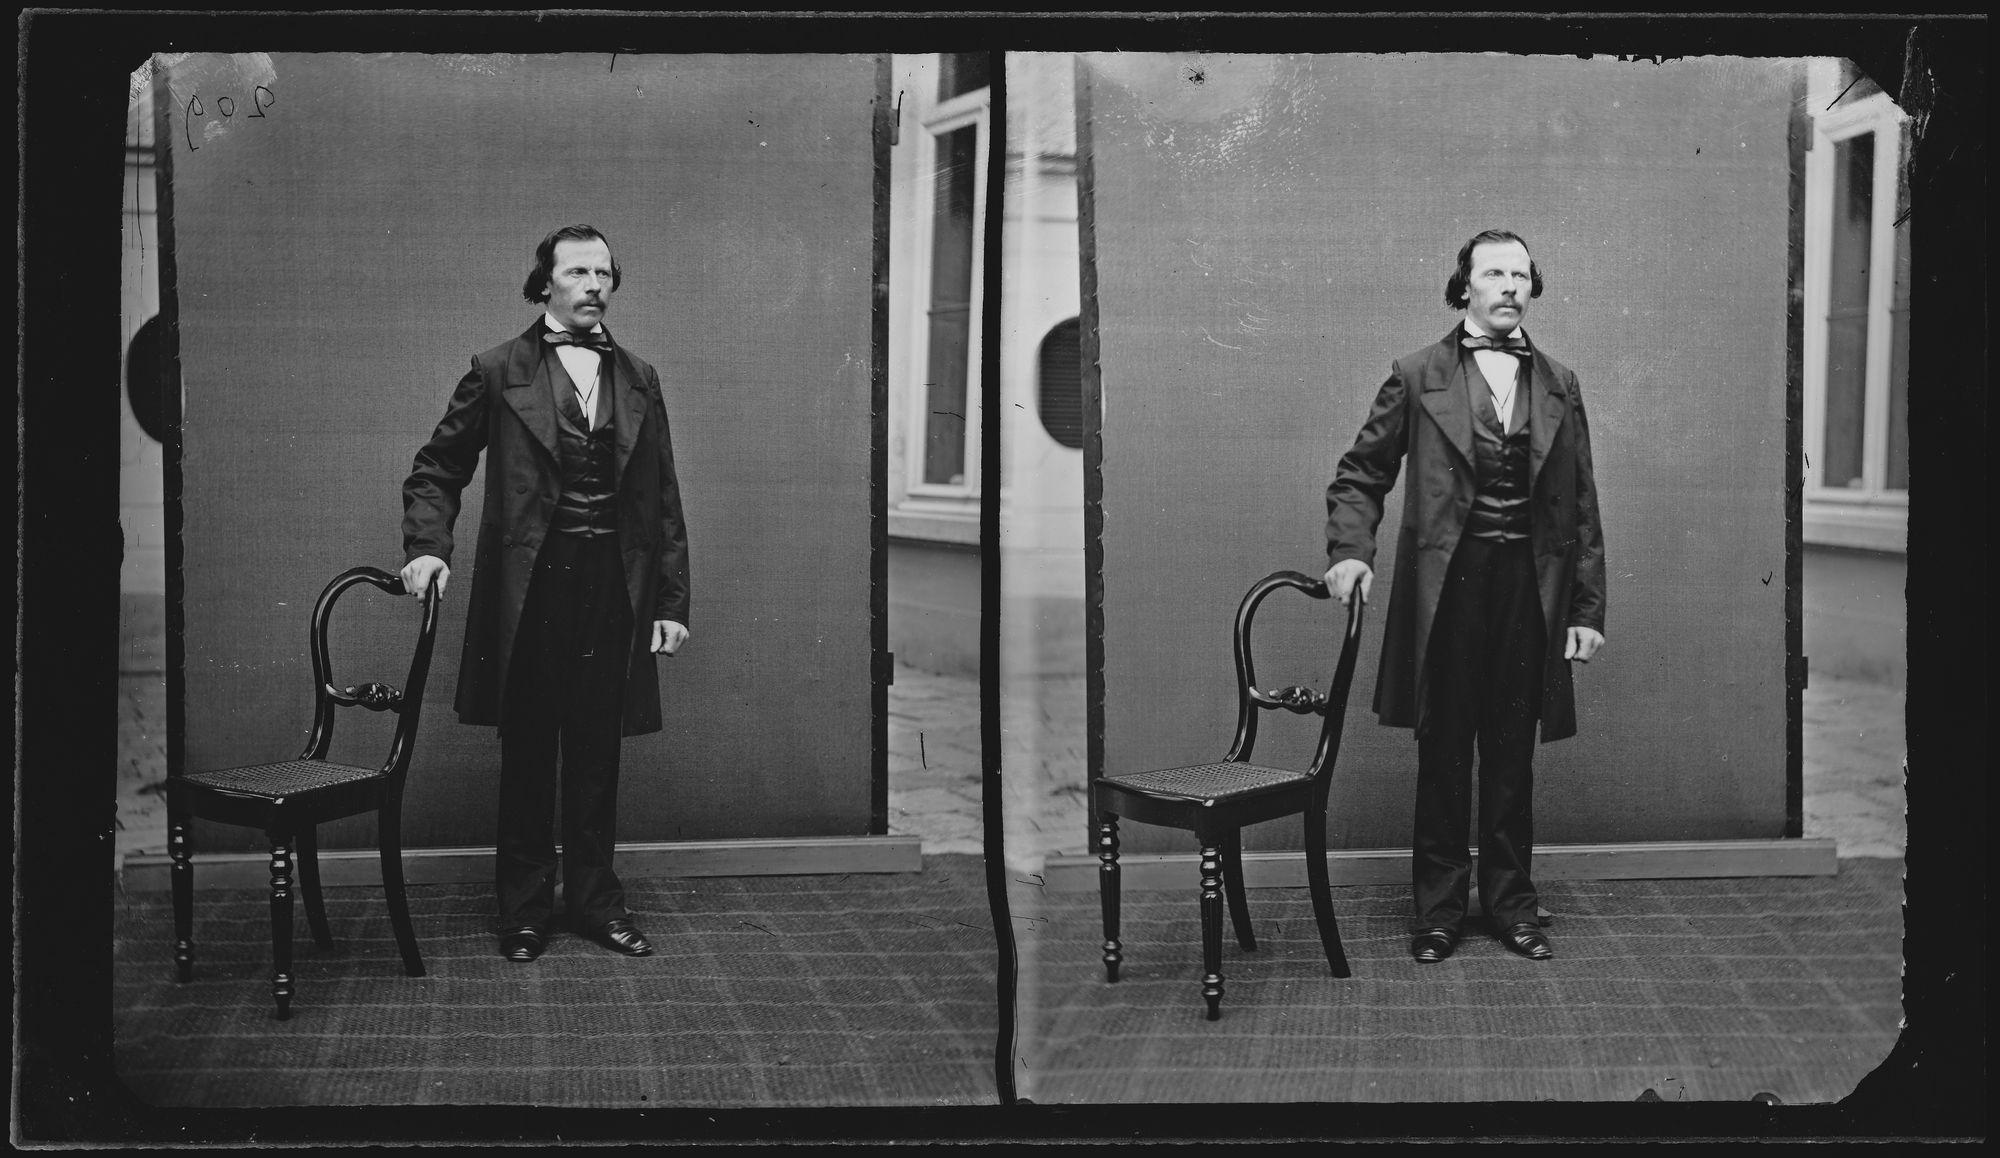 Portret van man in kostuum